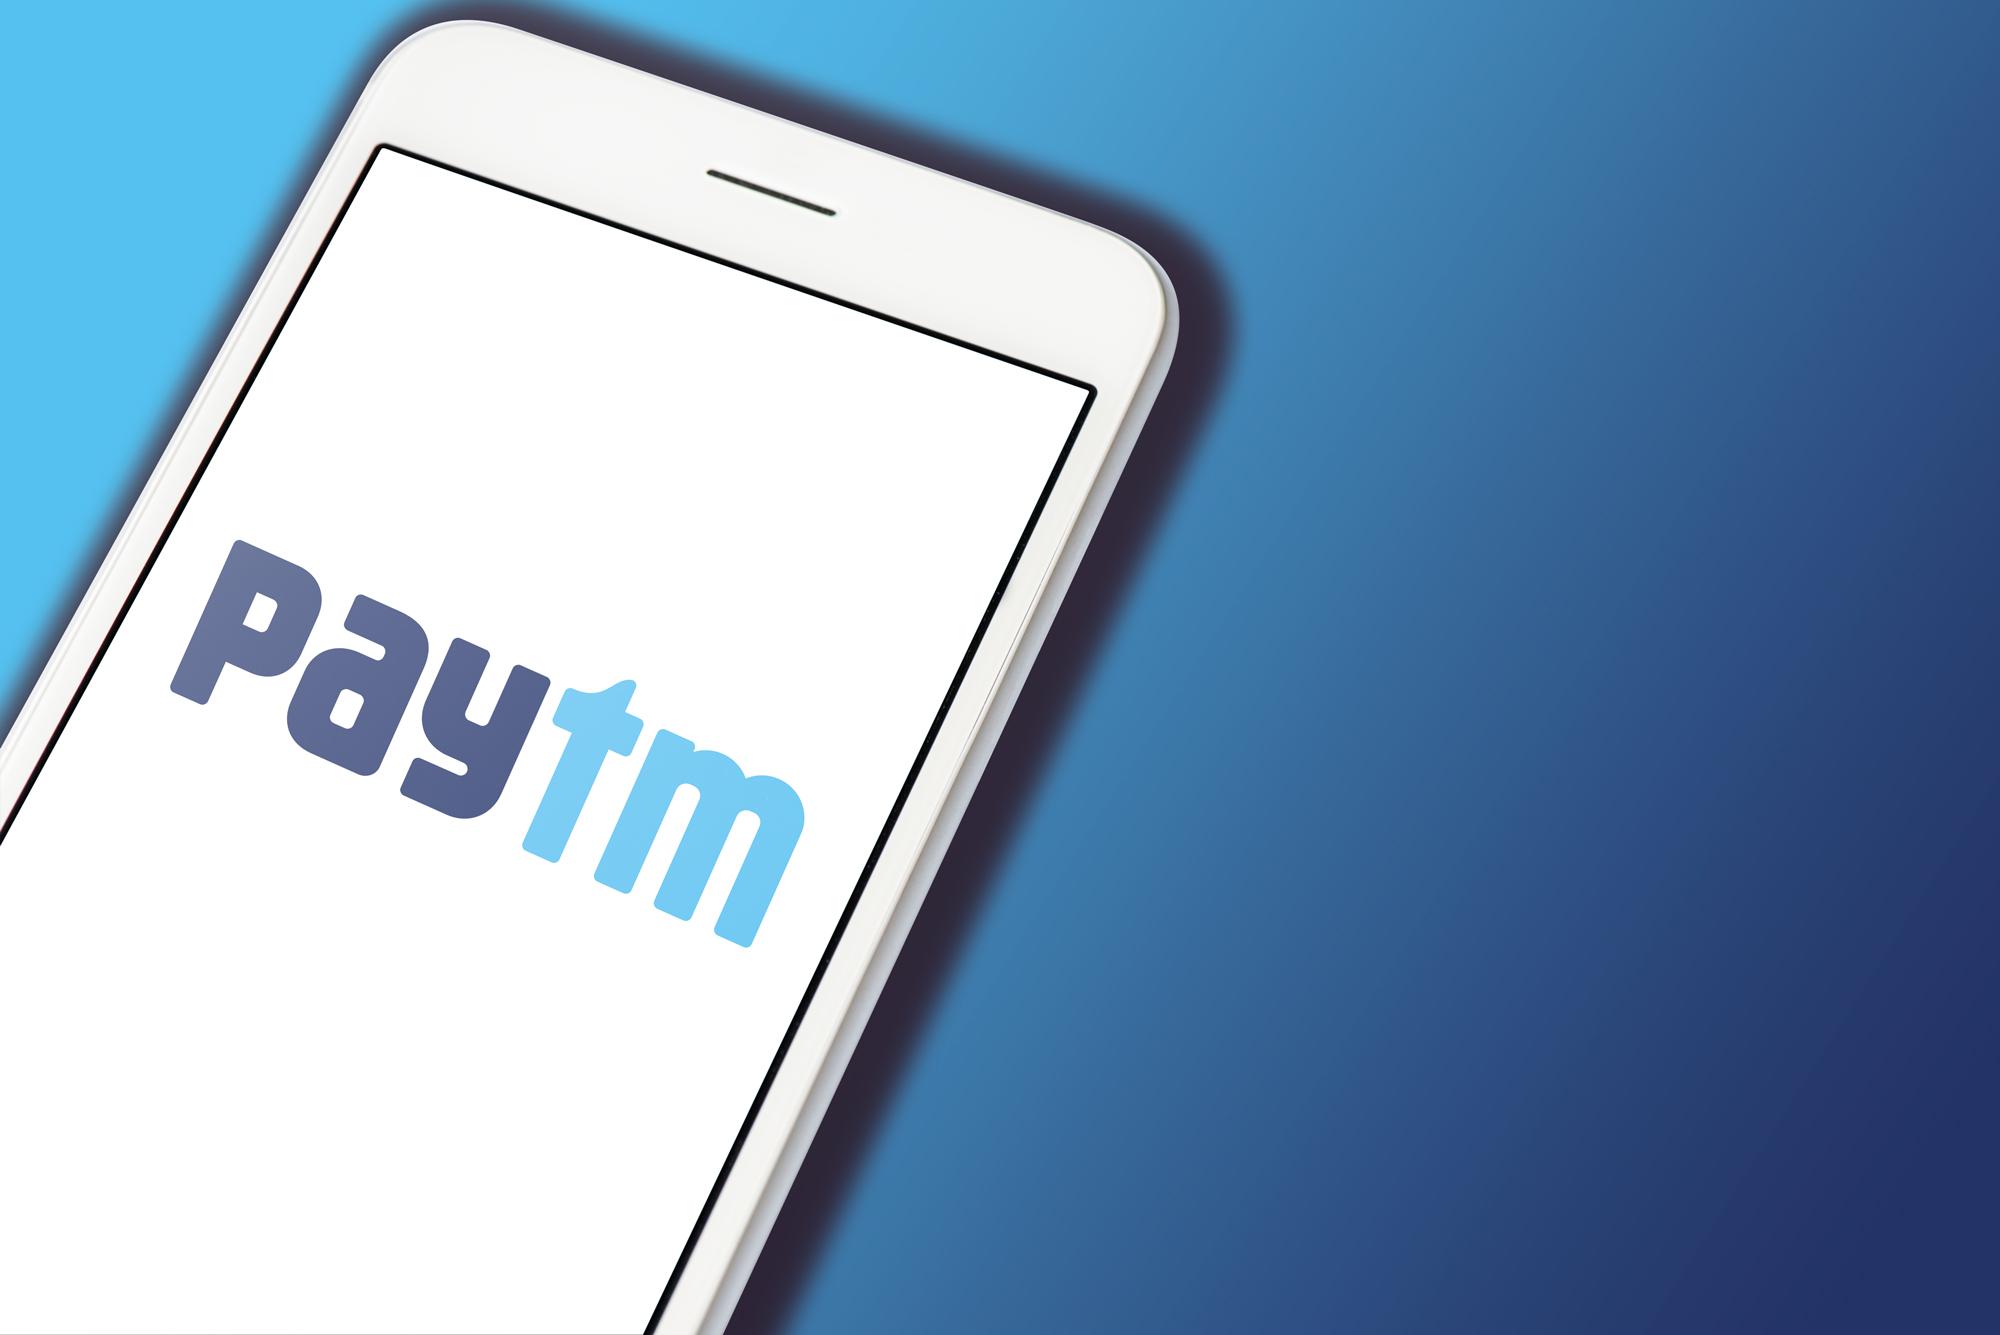 Paytm logo displayed on a White smartphone